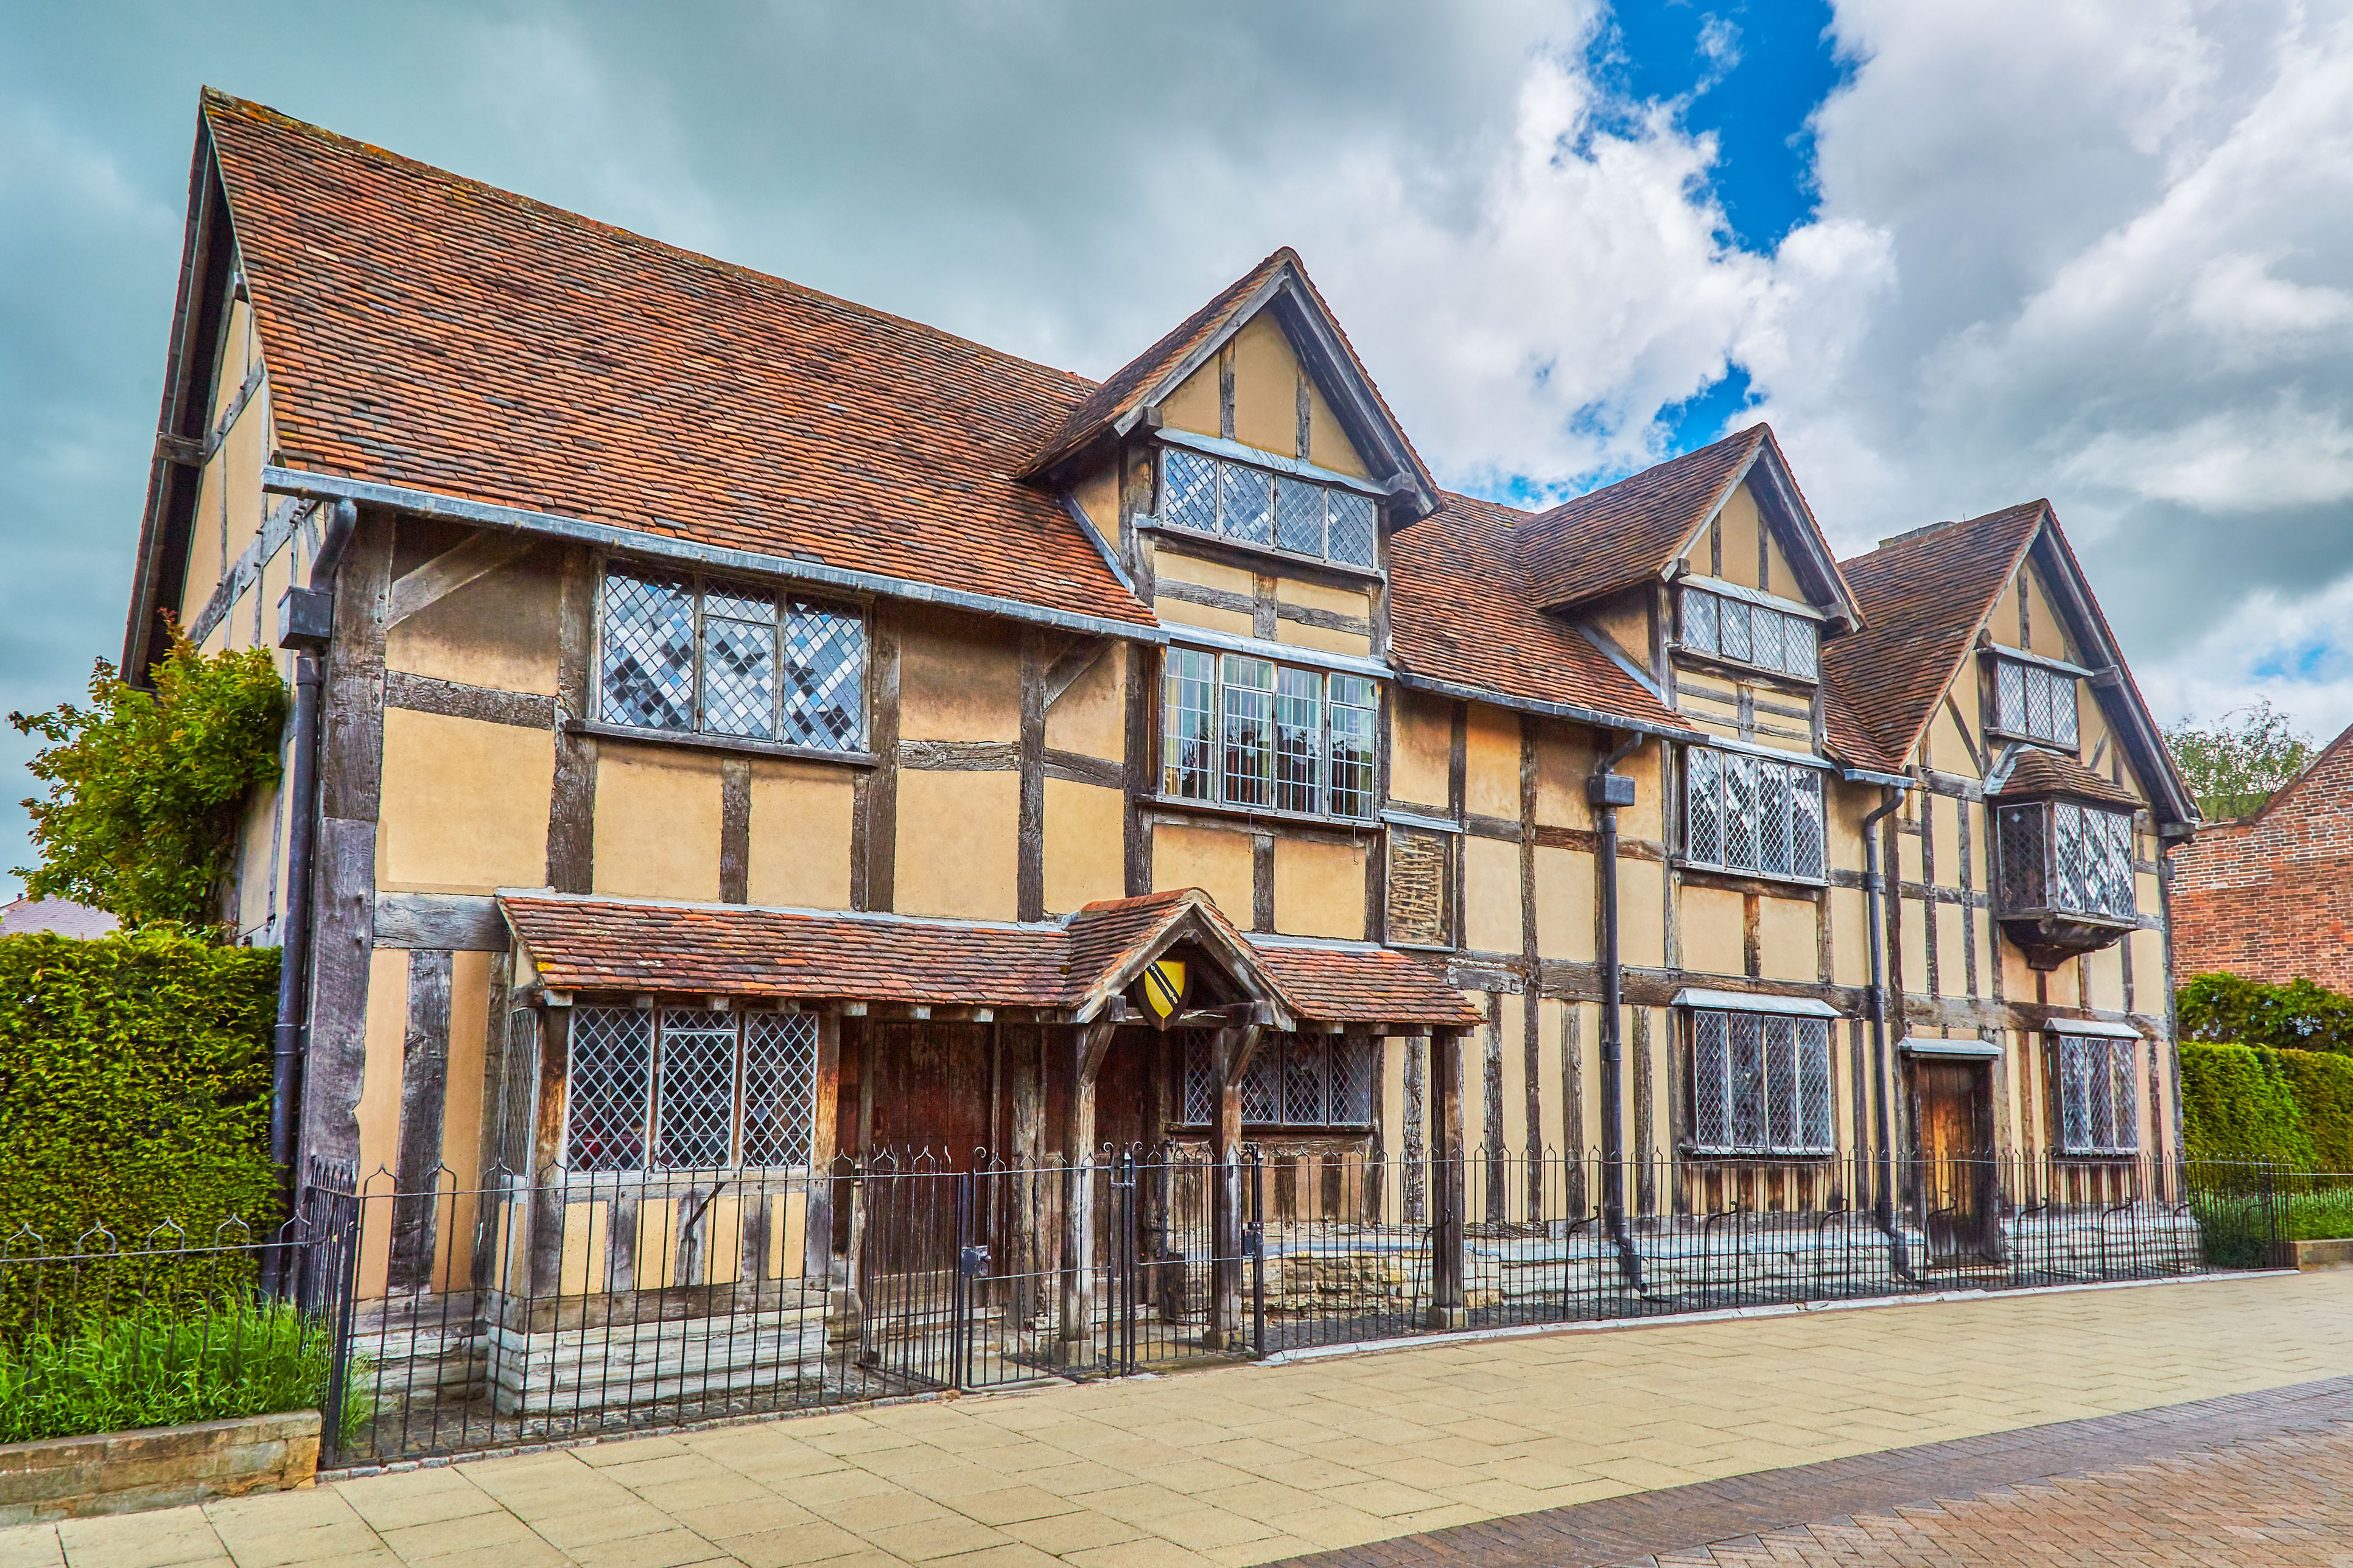 Shakespeares Birthplace, Stratford-upon-Avon